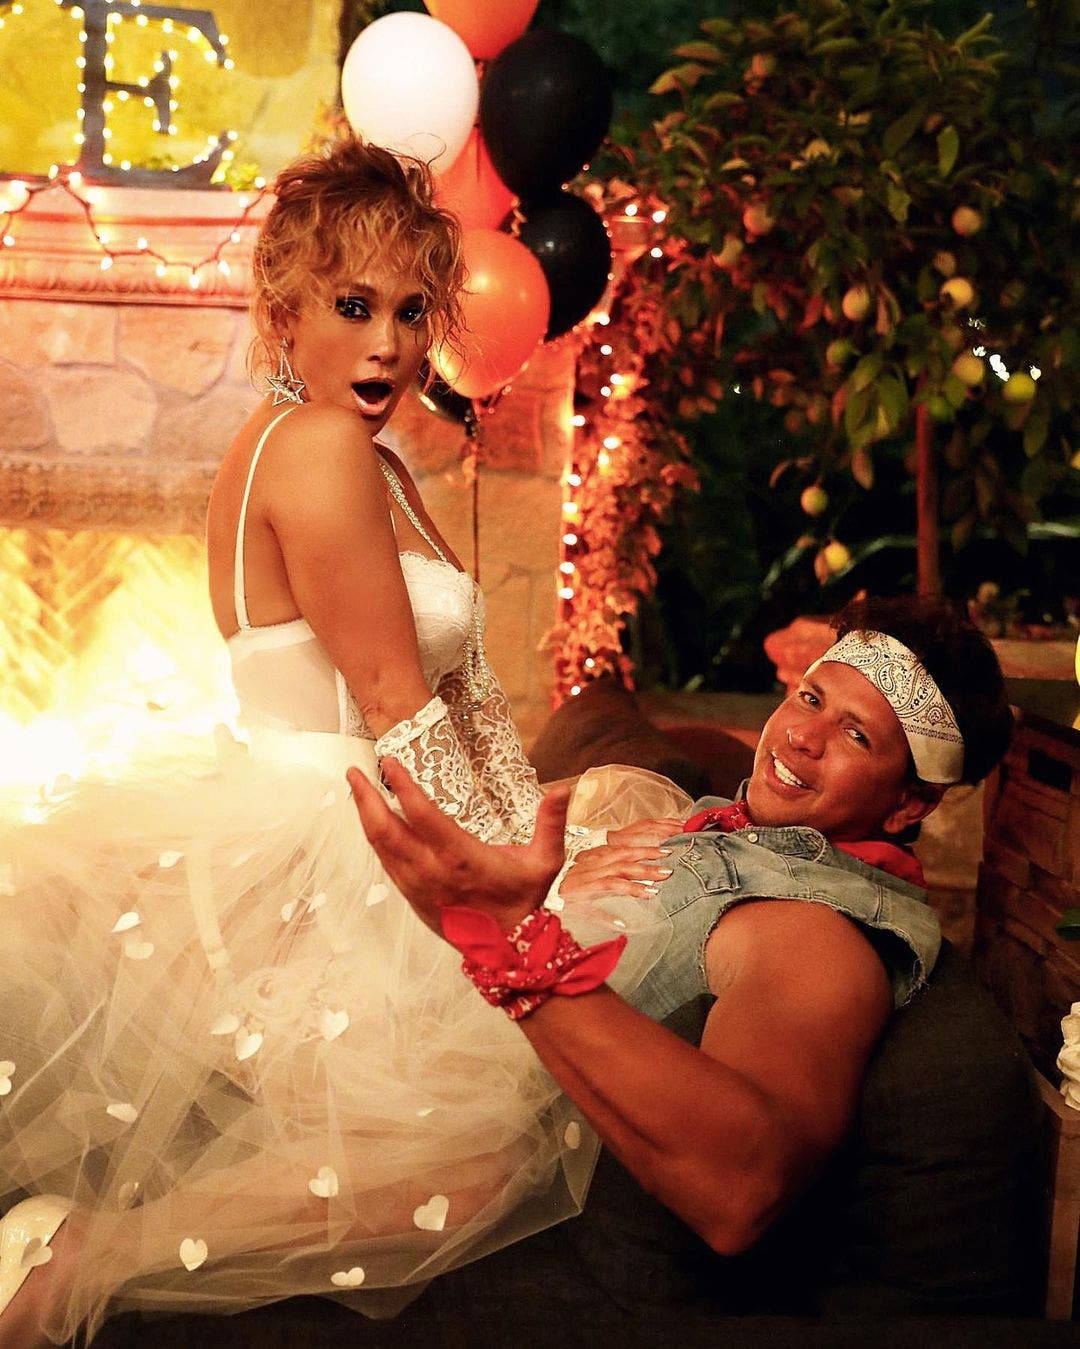 El video que Alex Rodríguez publicó horas antes de anunciar separación de Jennifer López